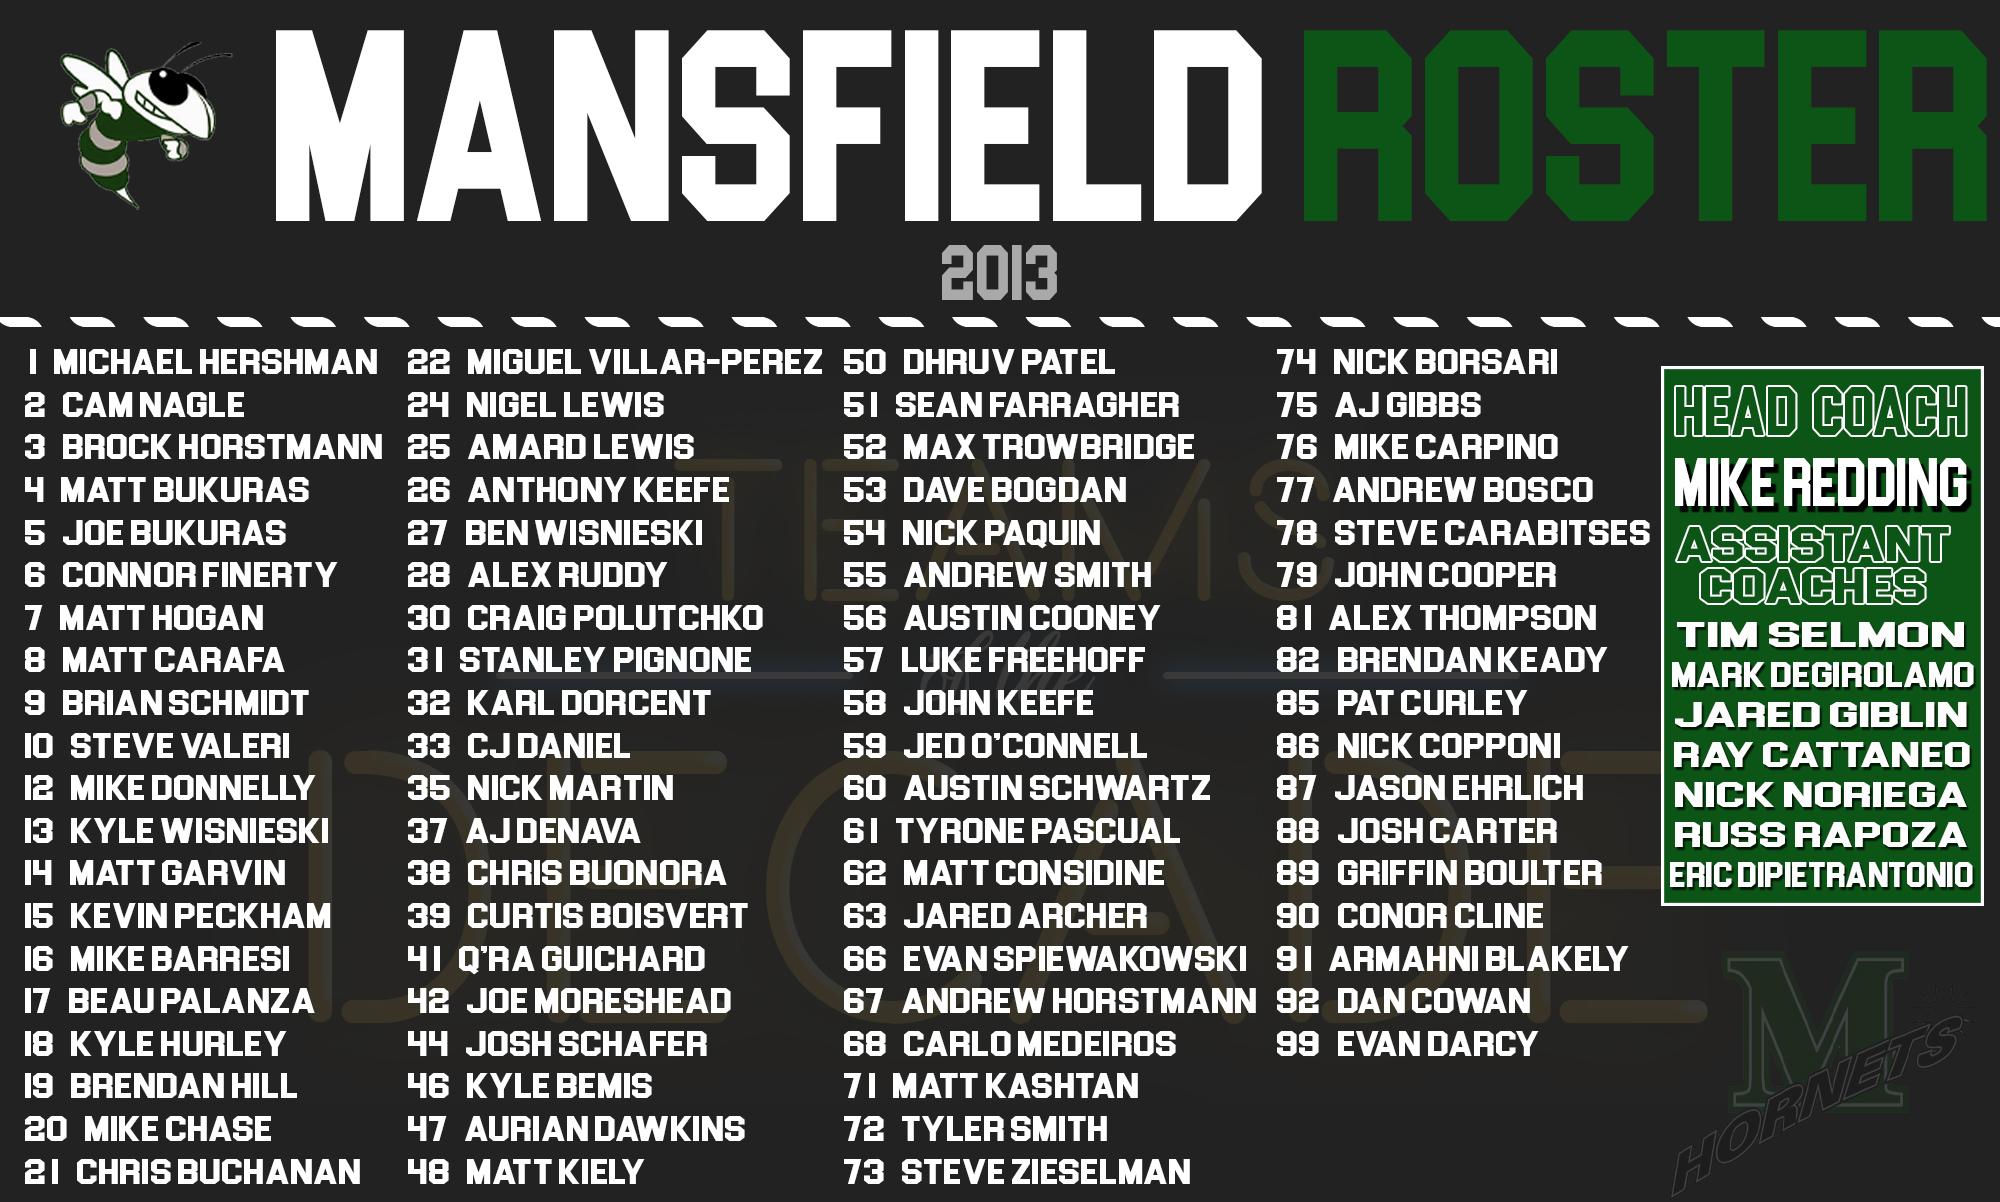 Mansfield football